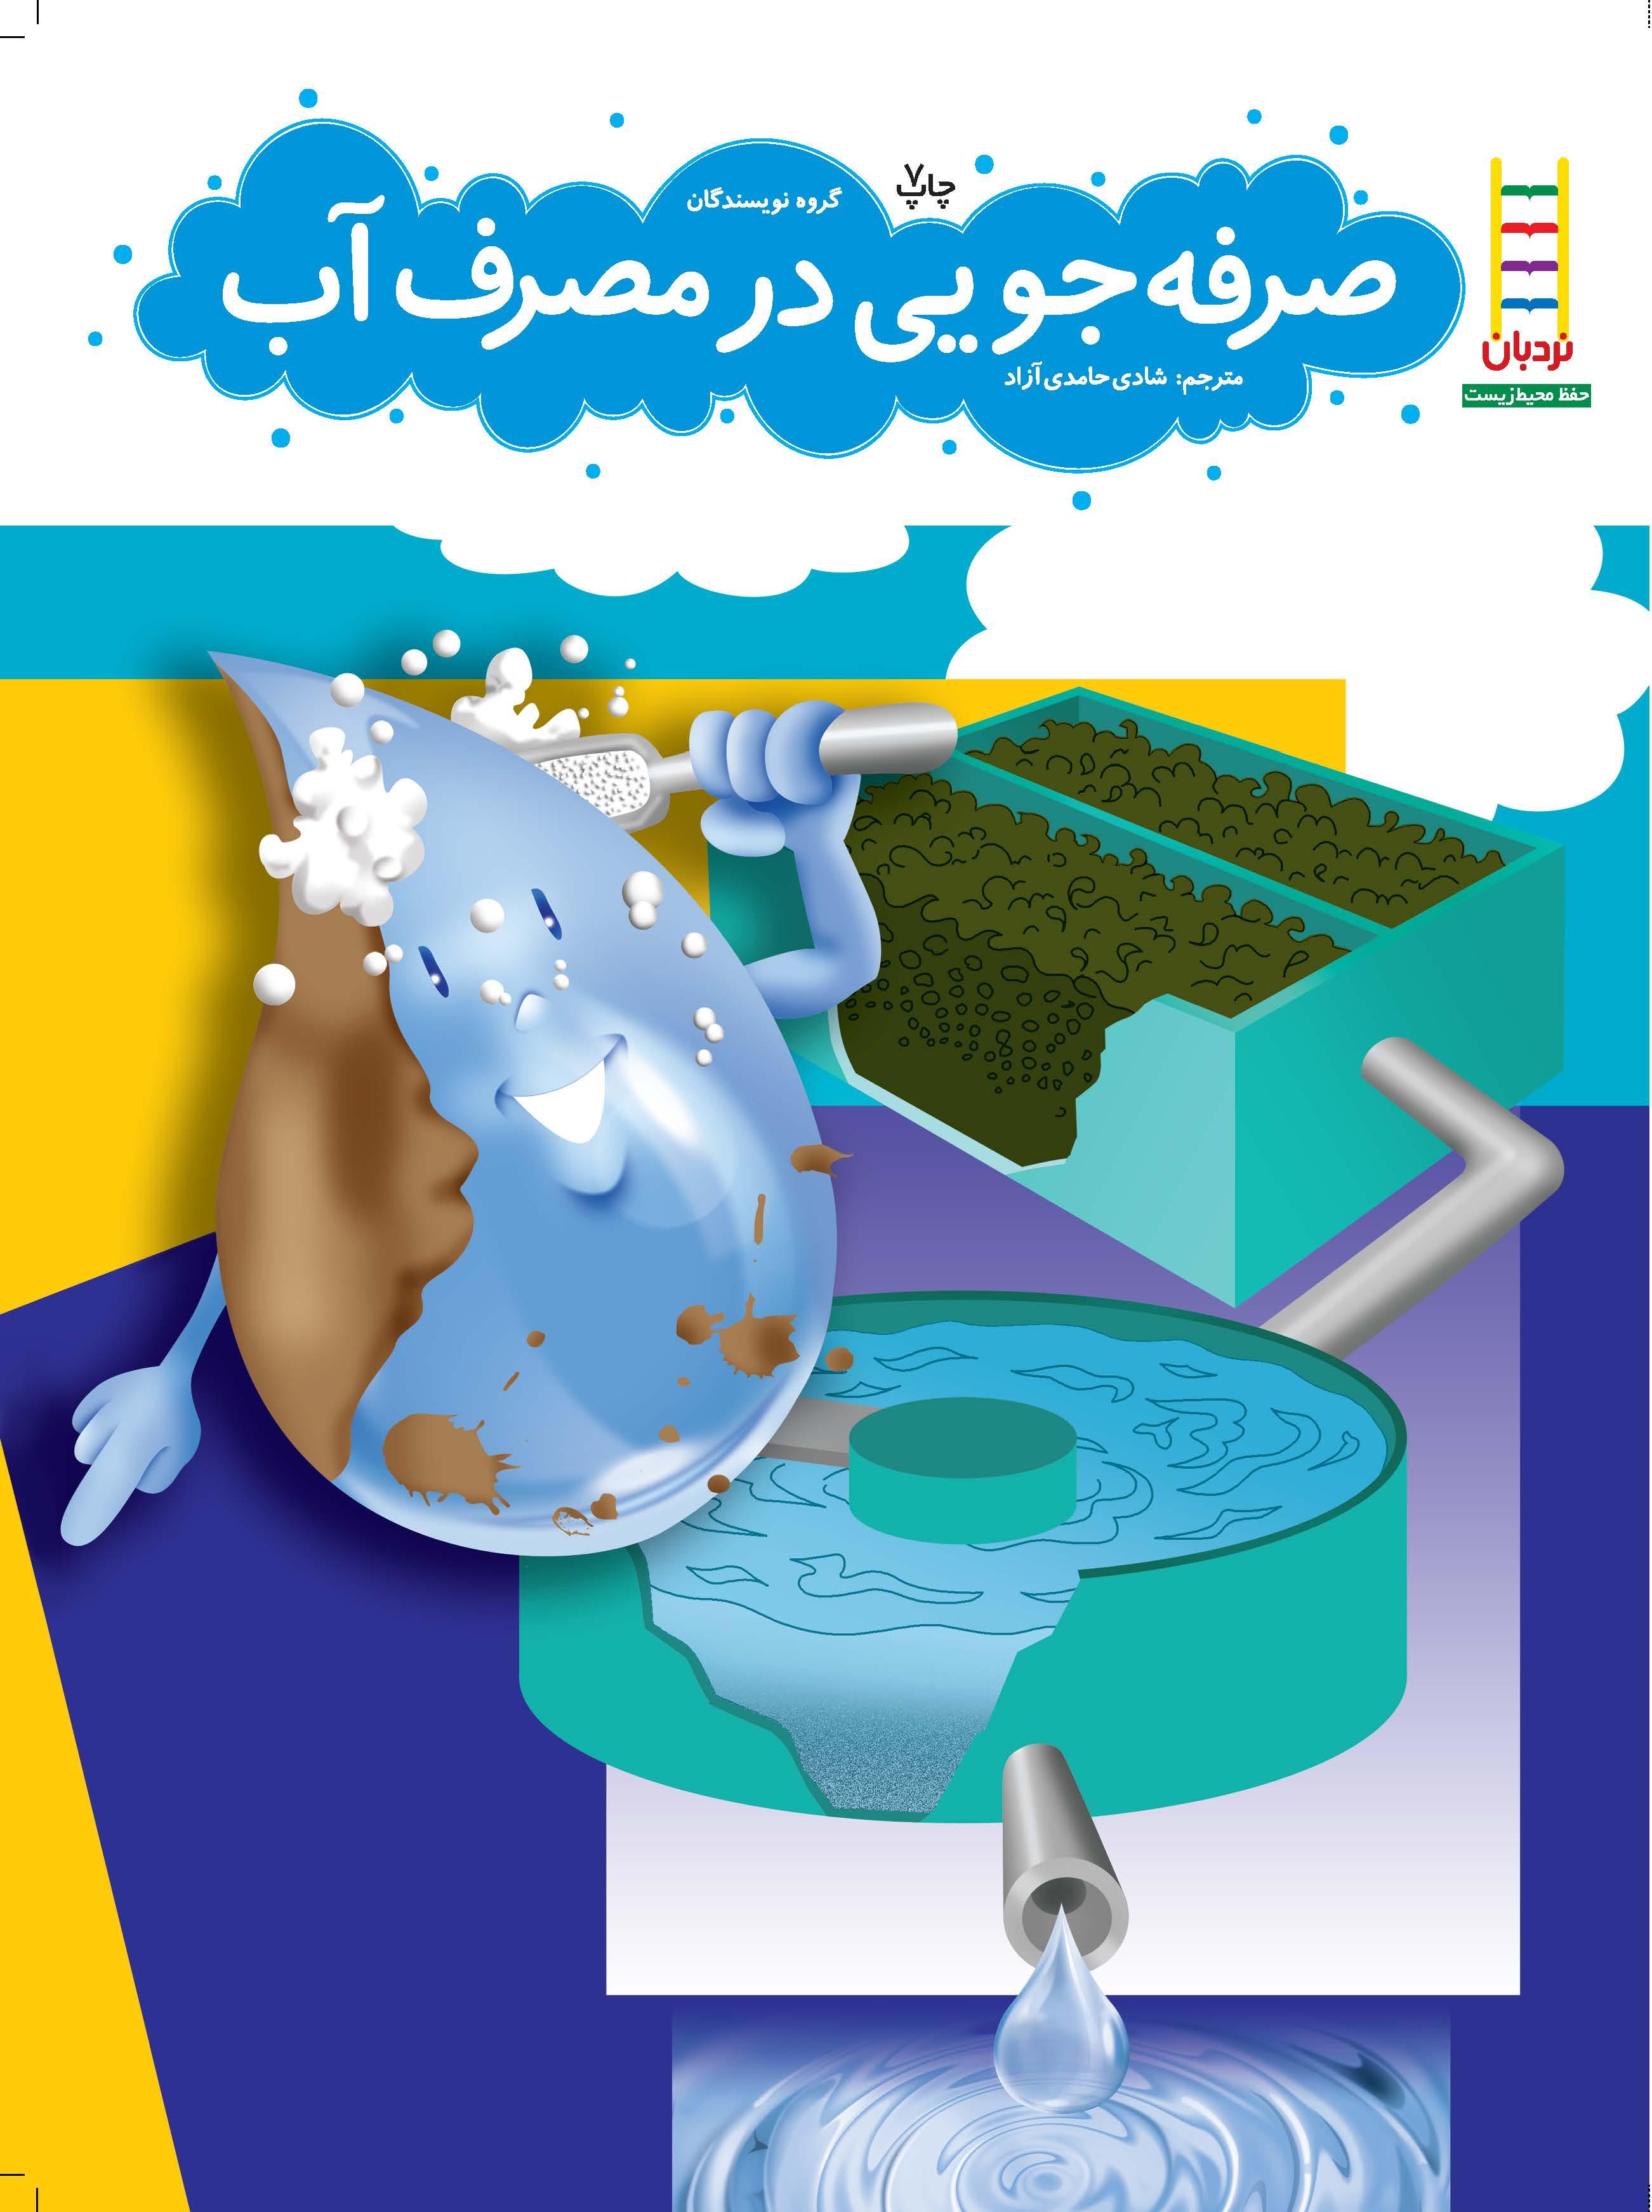 صرفه جويی در مصرف آب